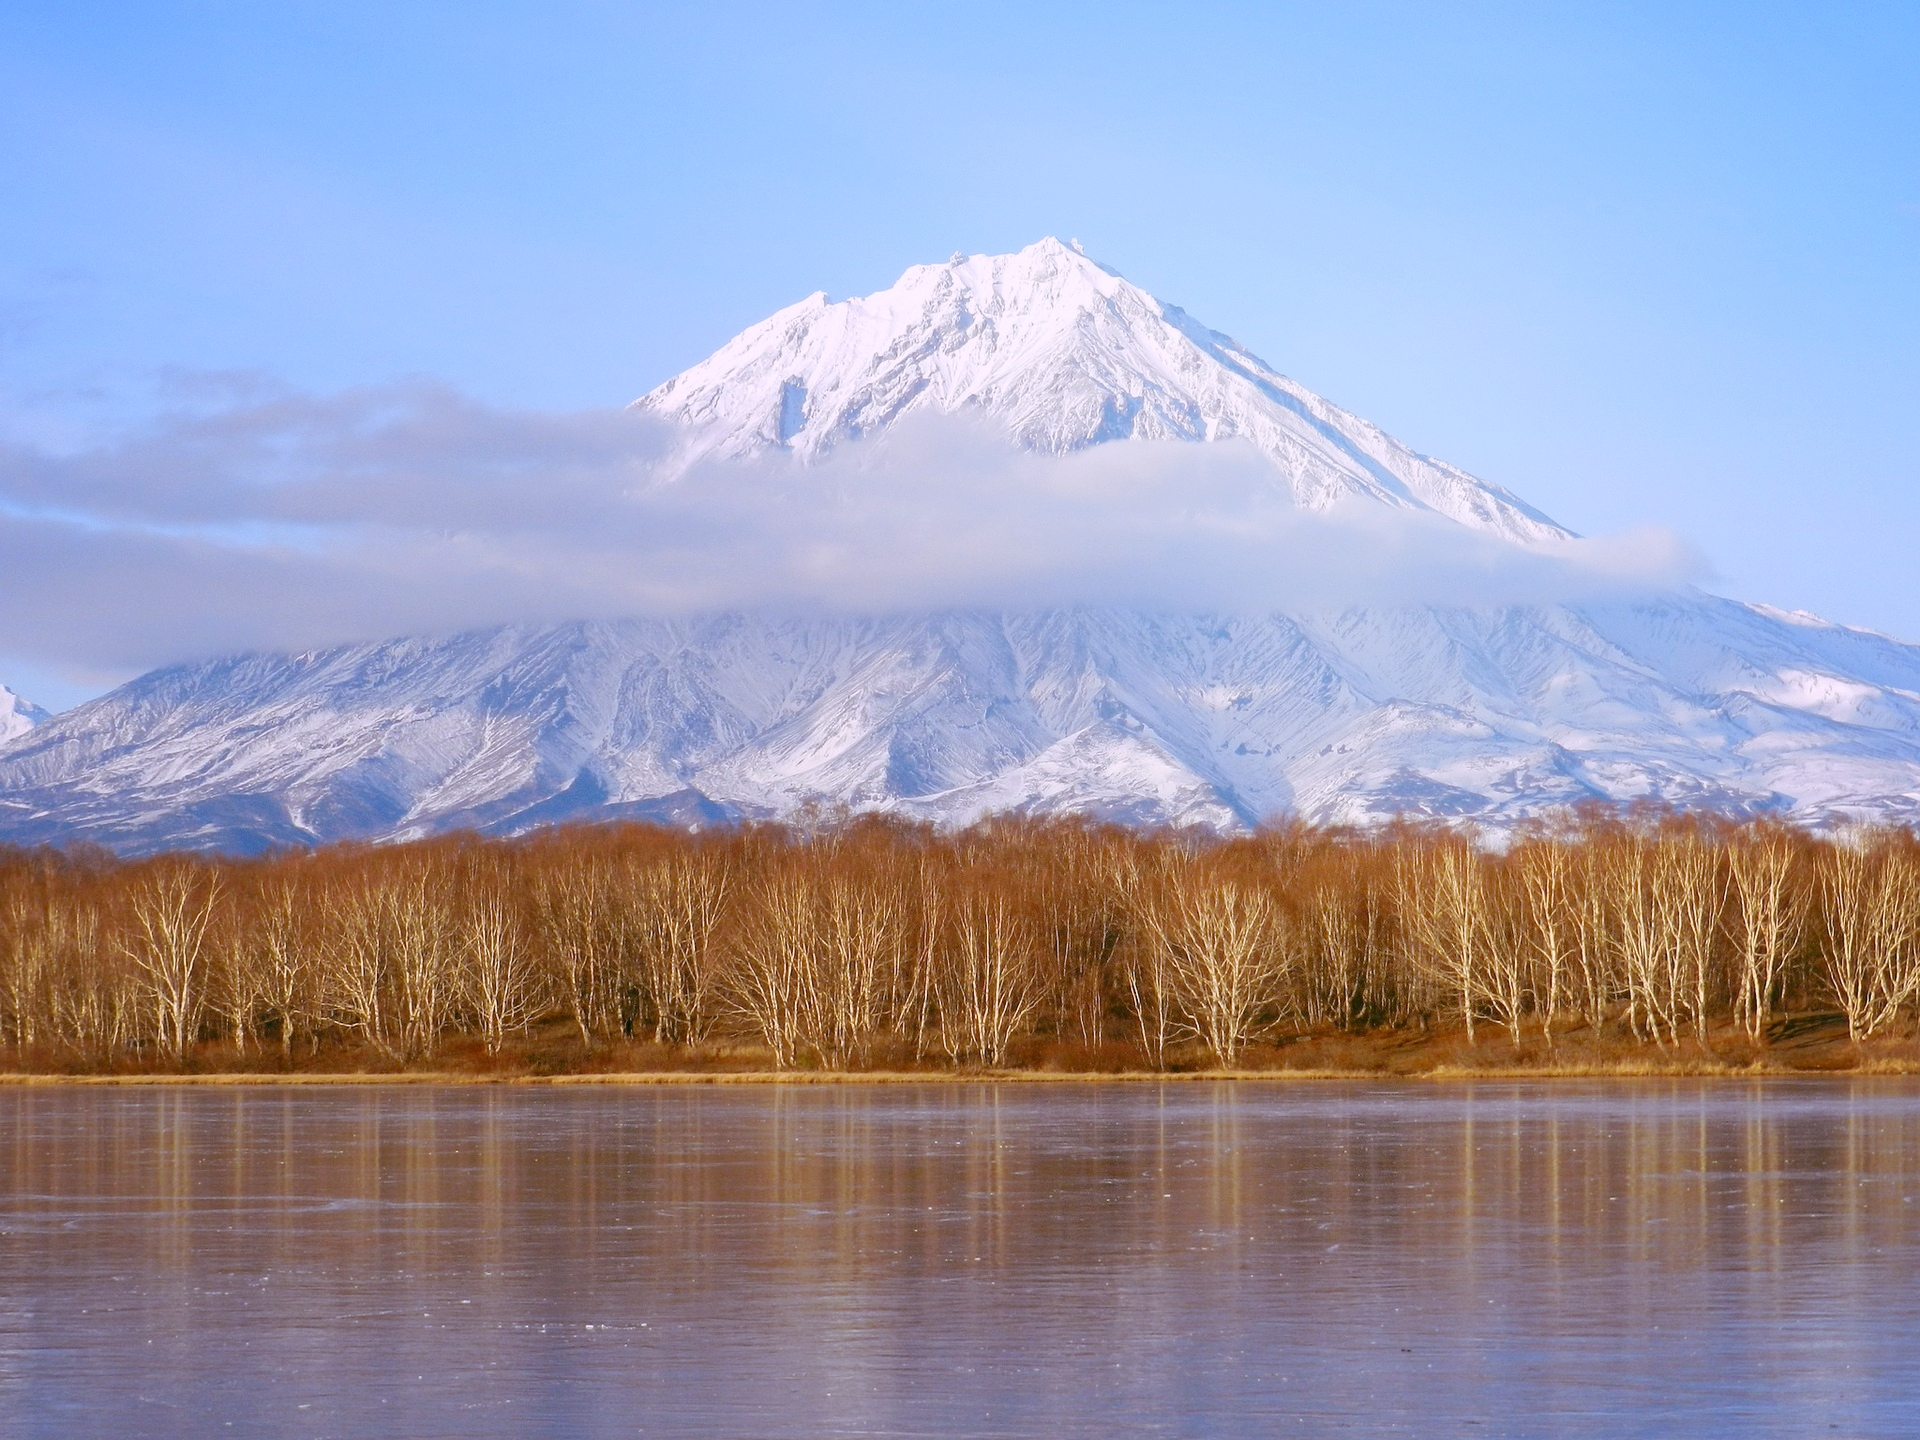 koryaksky-volcano-2788308_1920.jpg